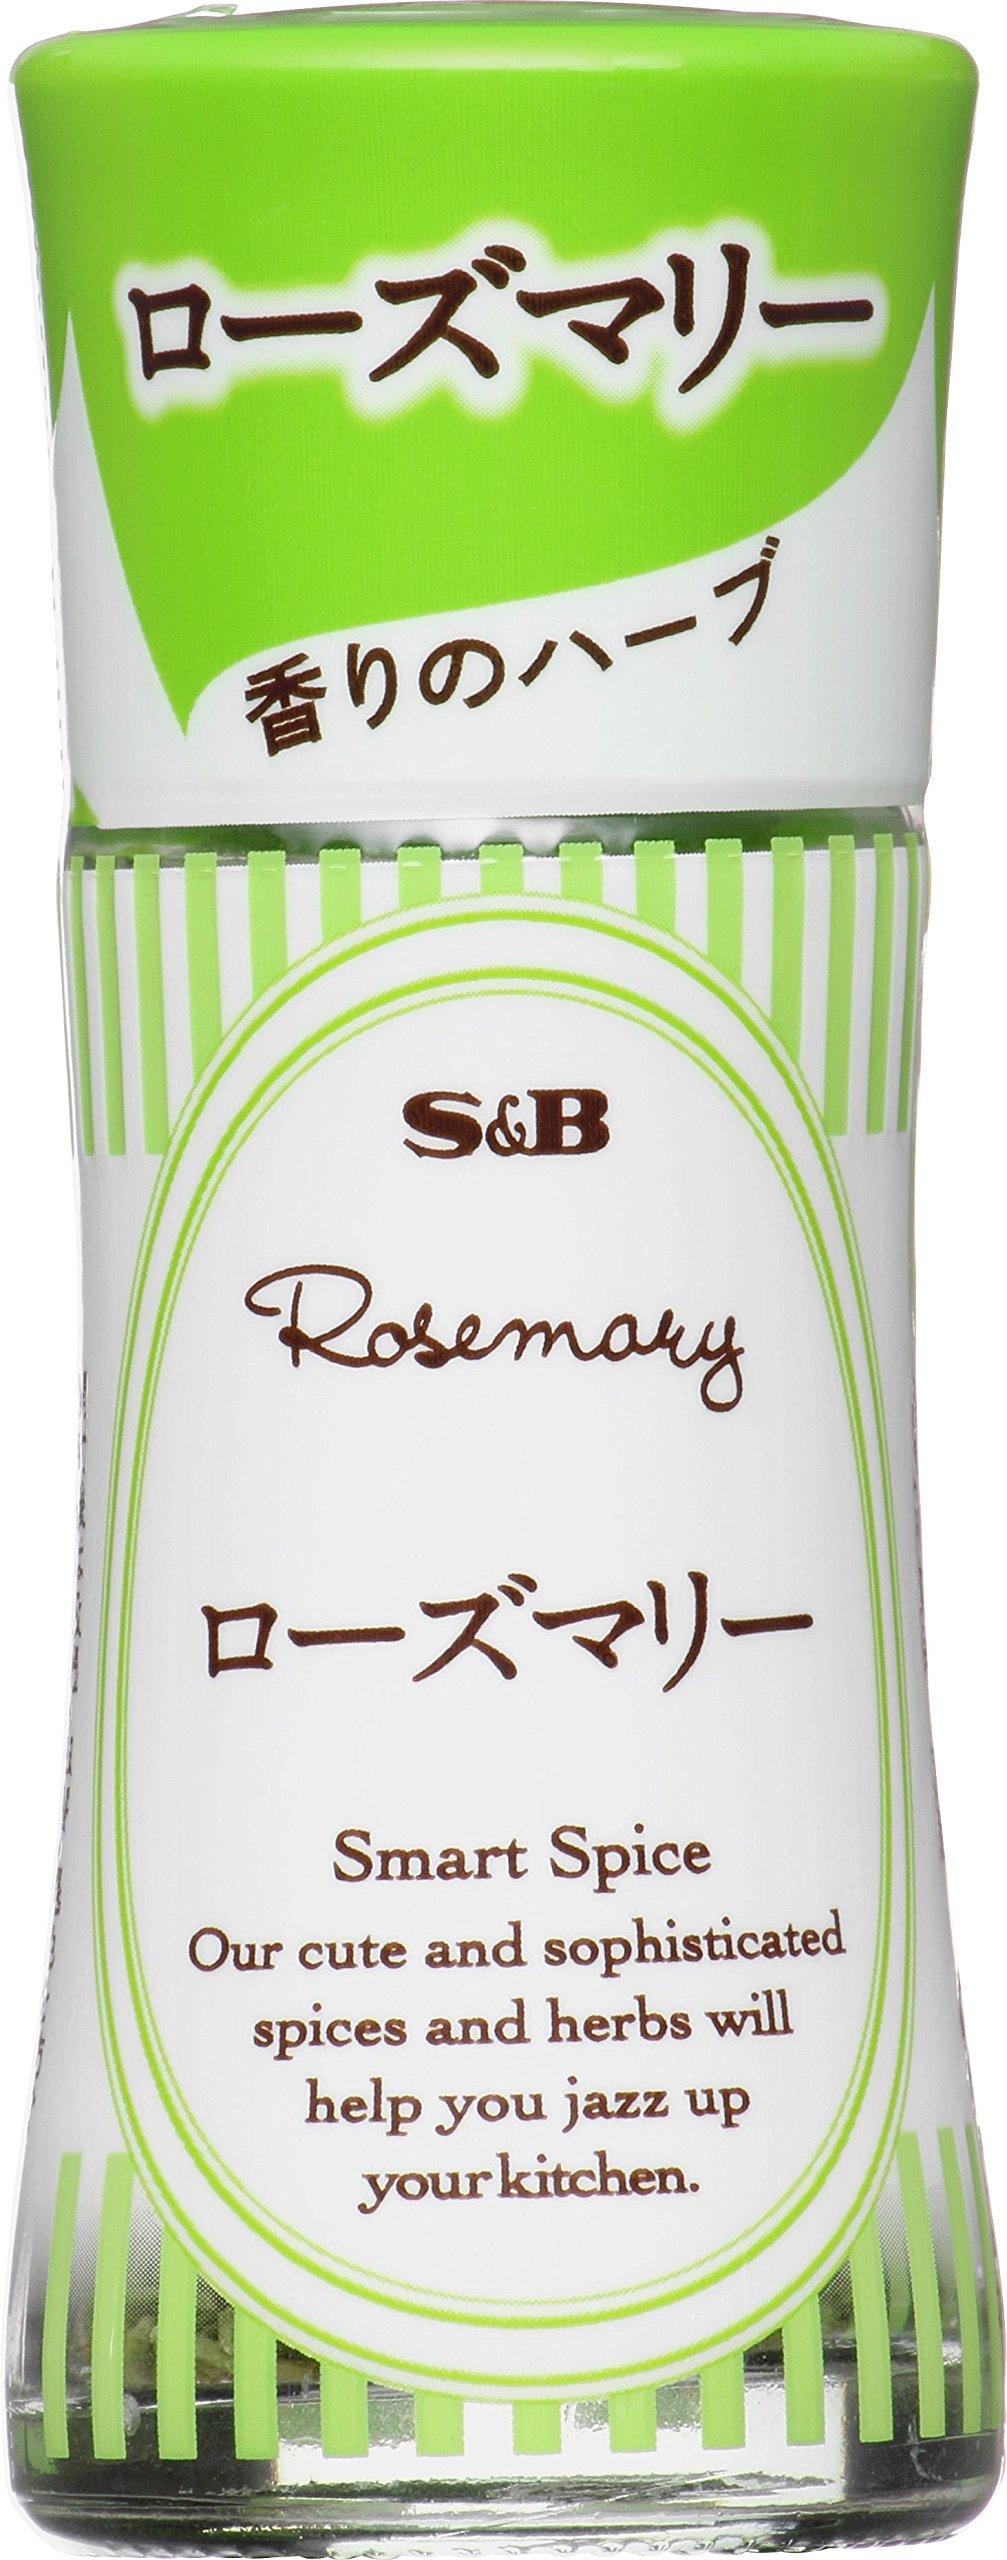 S & B Smart Spice Rosemary 4.2gX5 pieces